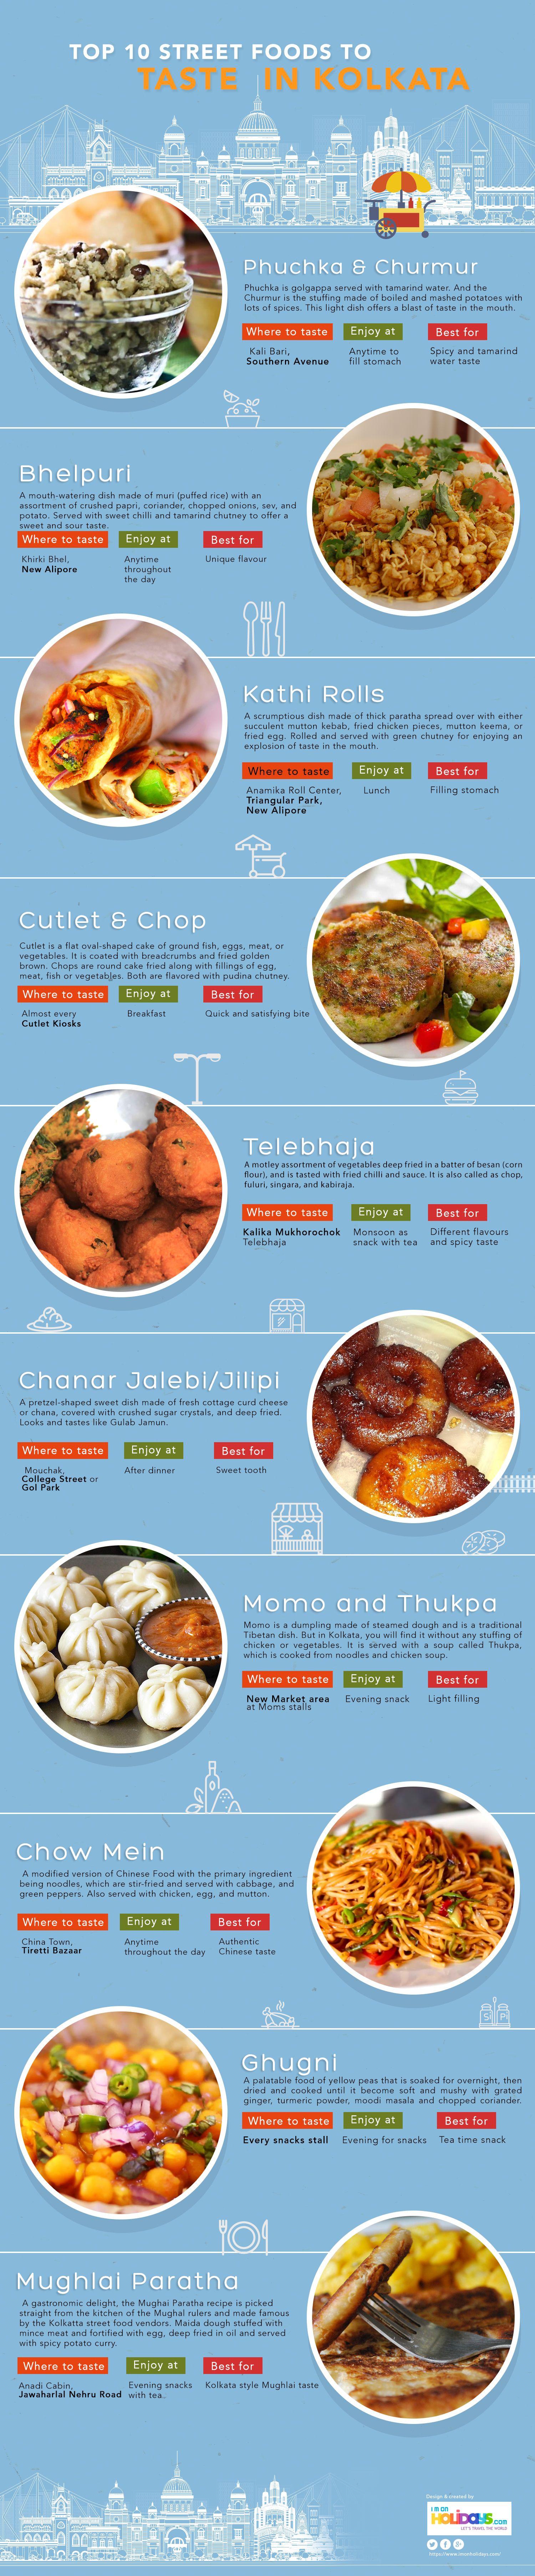 Top 10 Street Foods to Taste in Kolkata #Infographic | Kolkata, Food ...